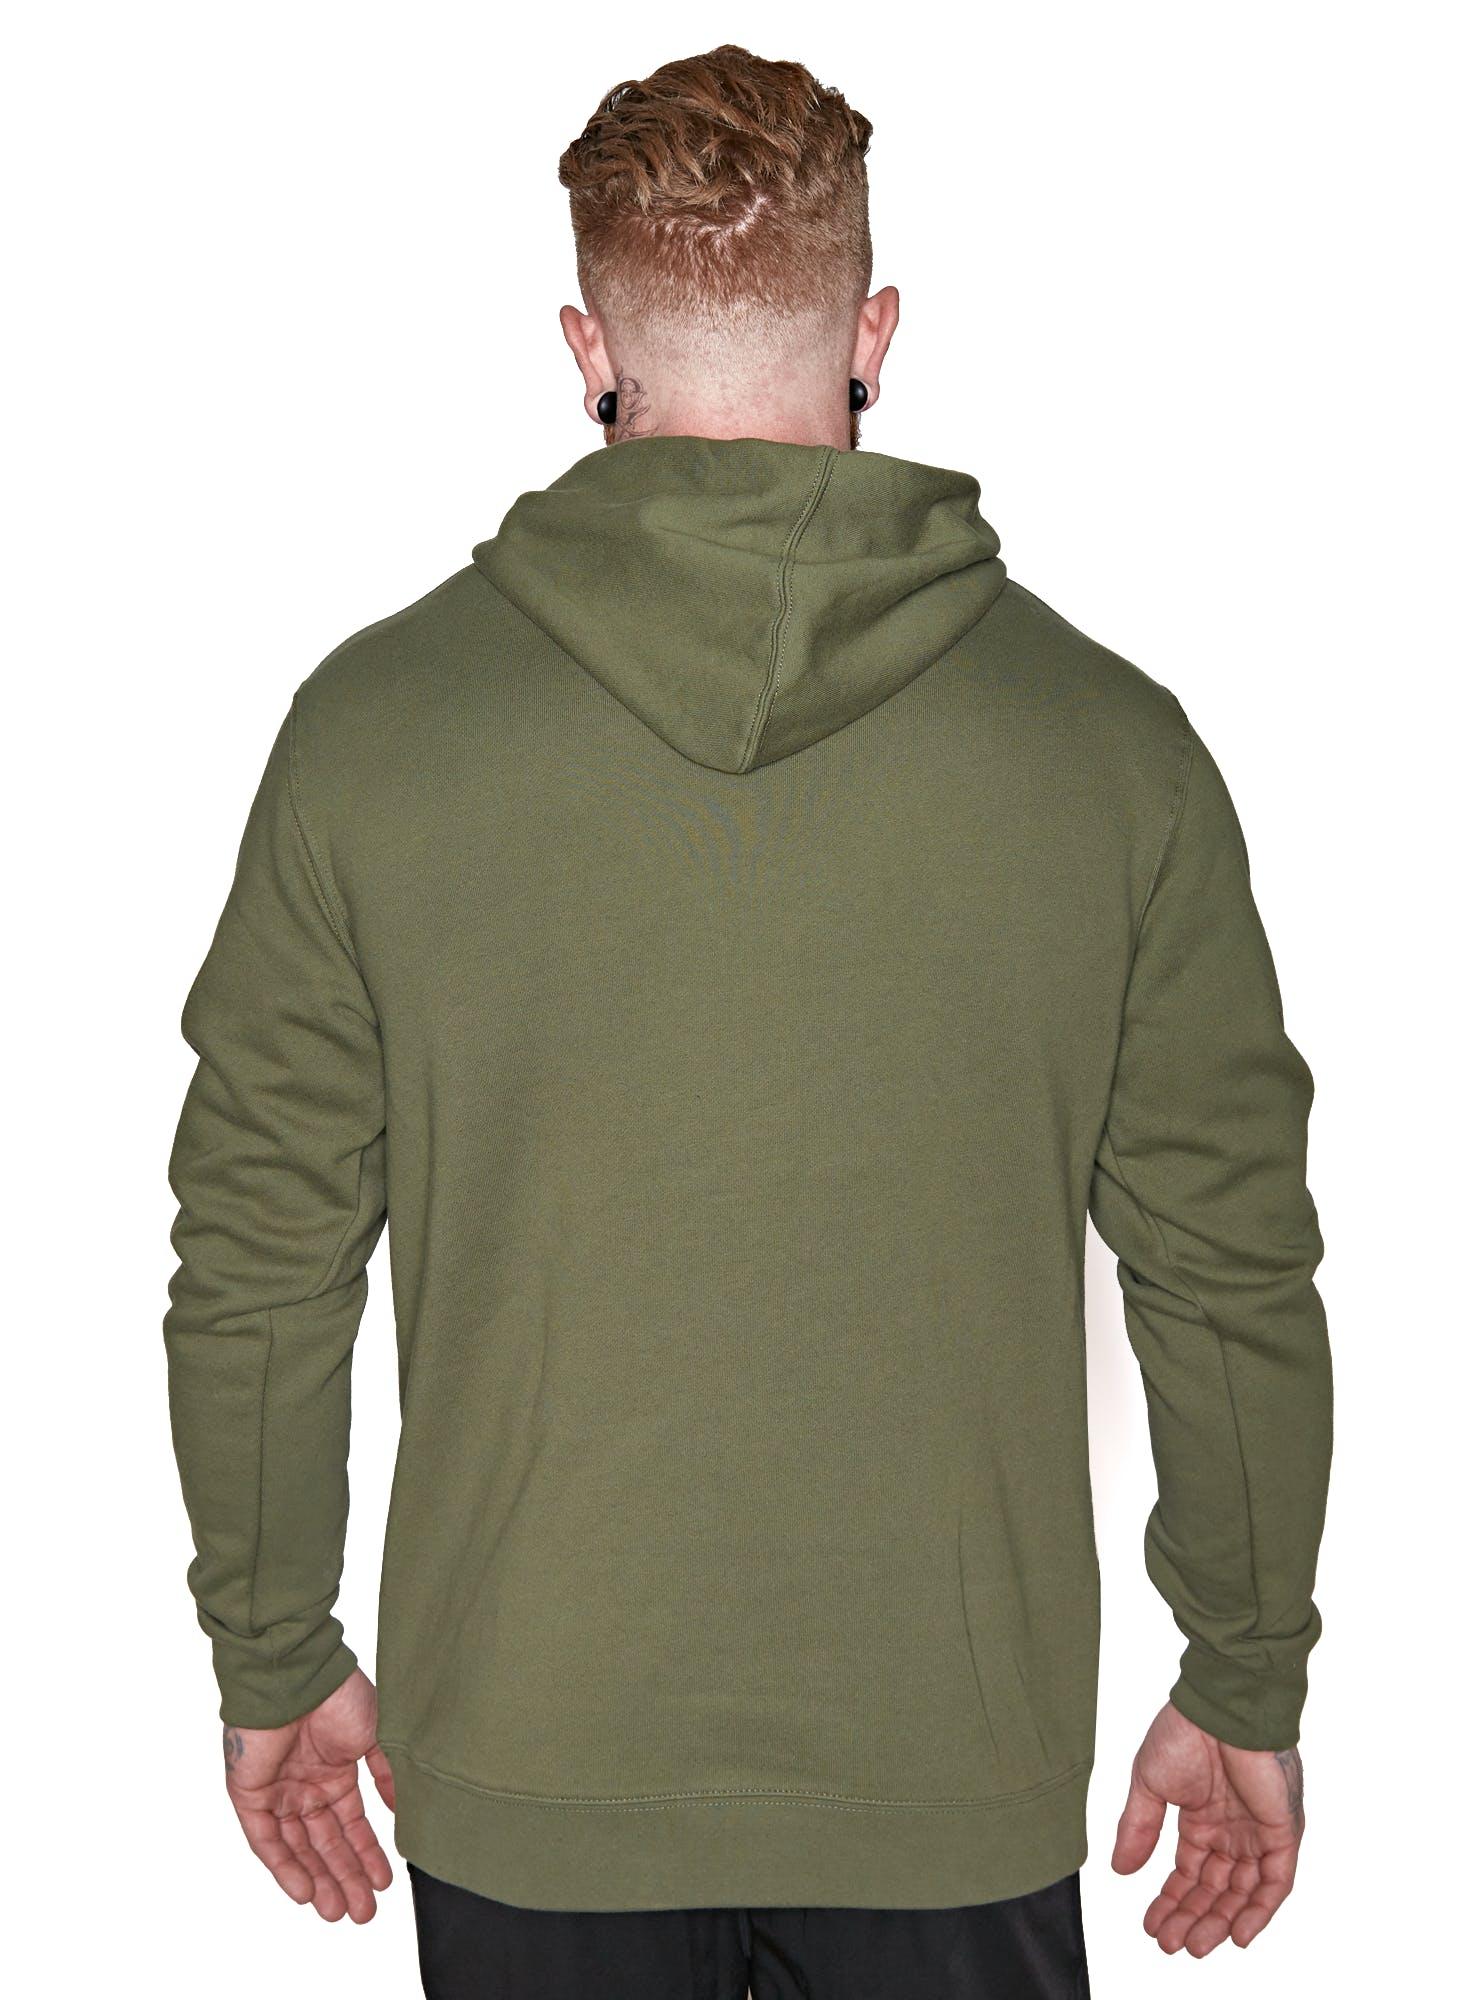 Onnit Linear Pullover Hoodie Bonus Image